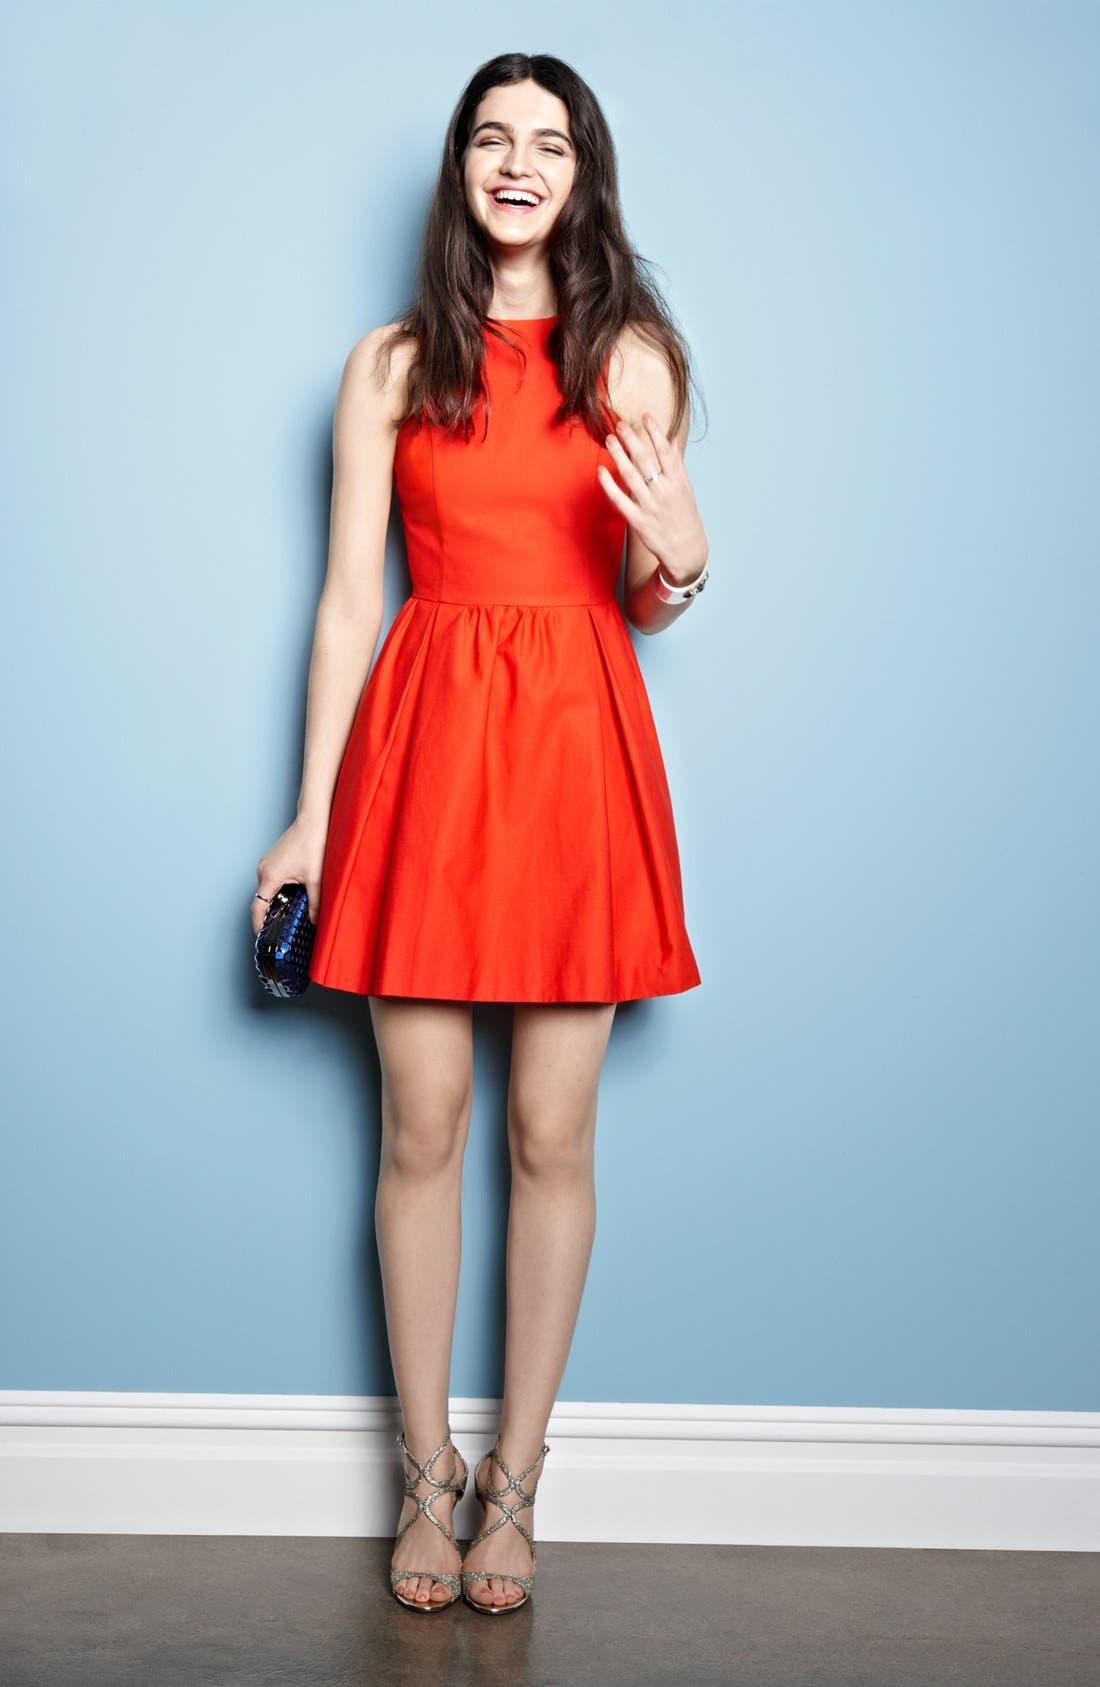 Main Image - BB Dakota Cotton Dress & Accessories